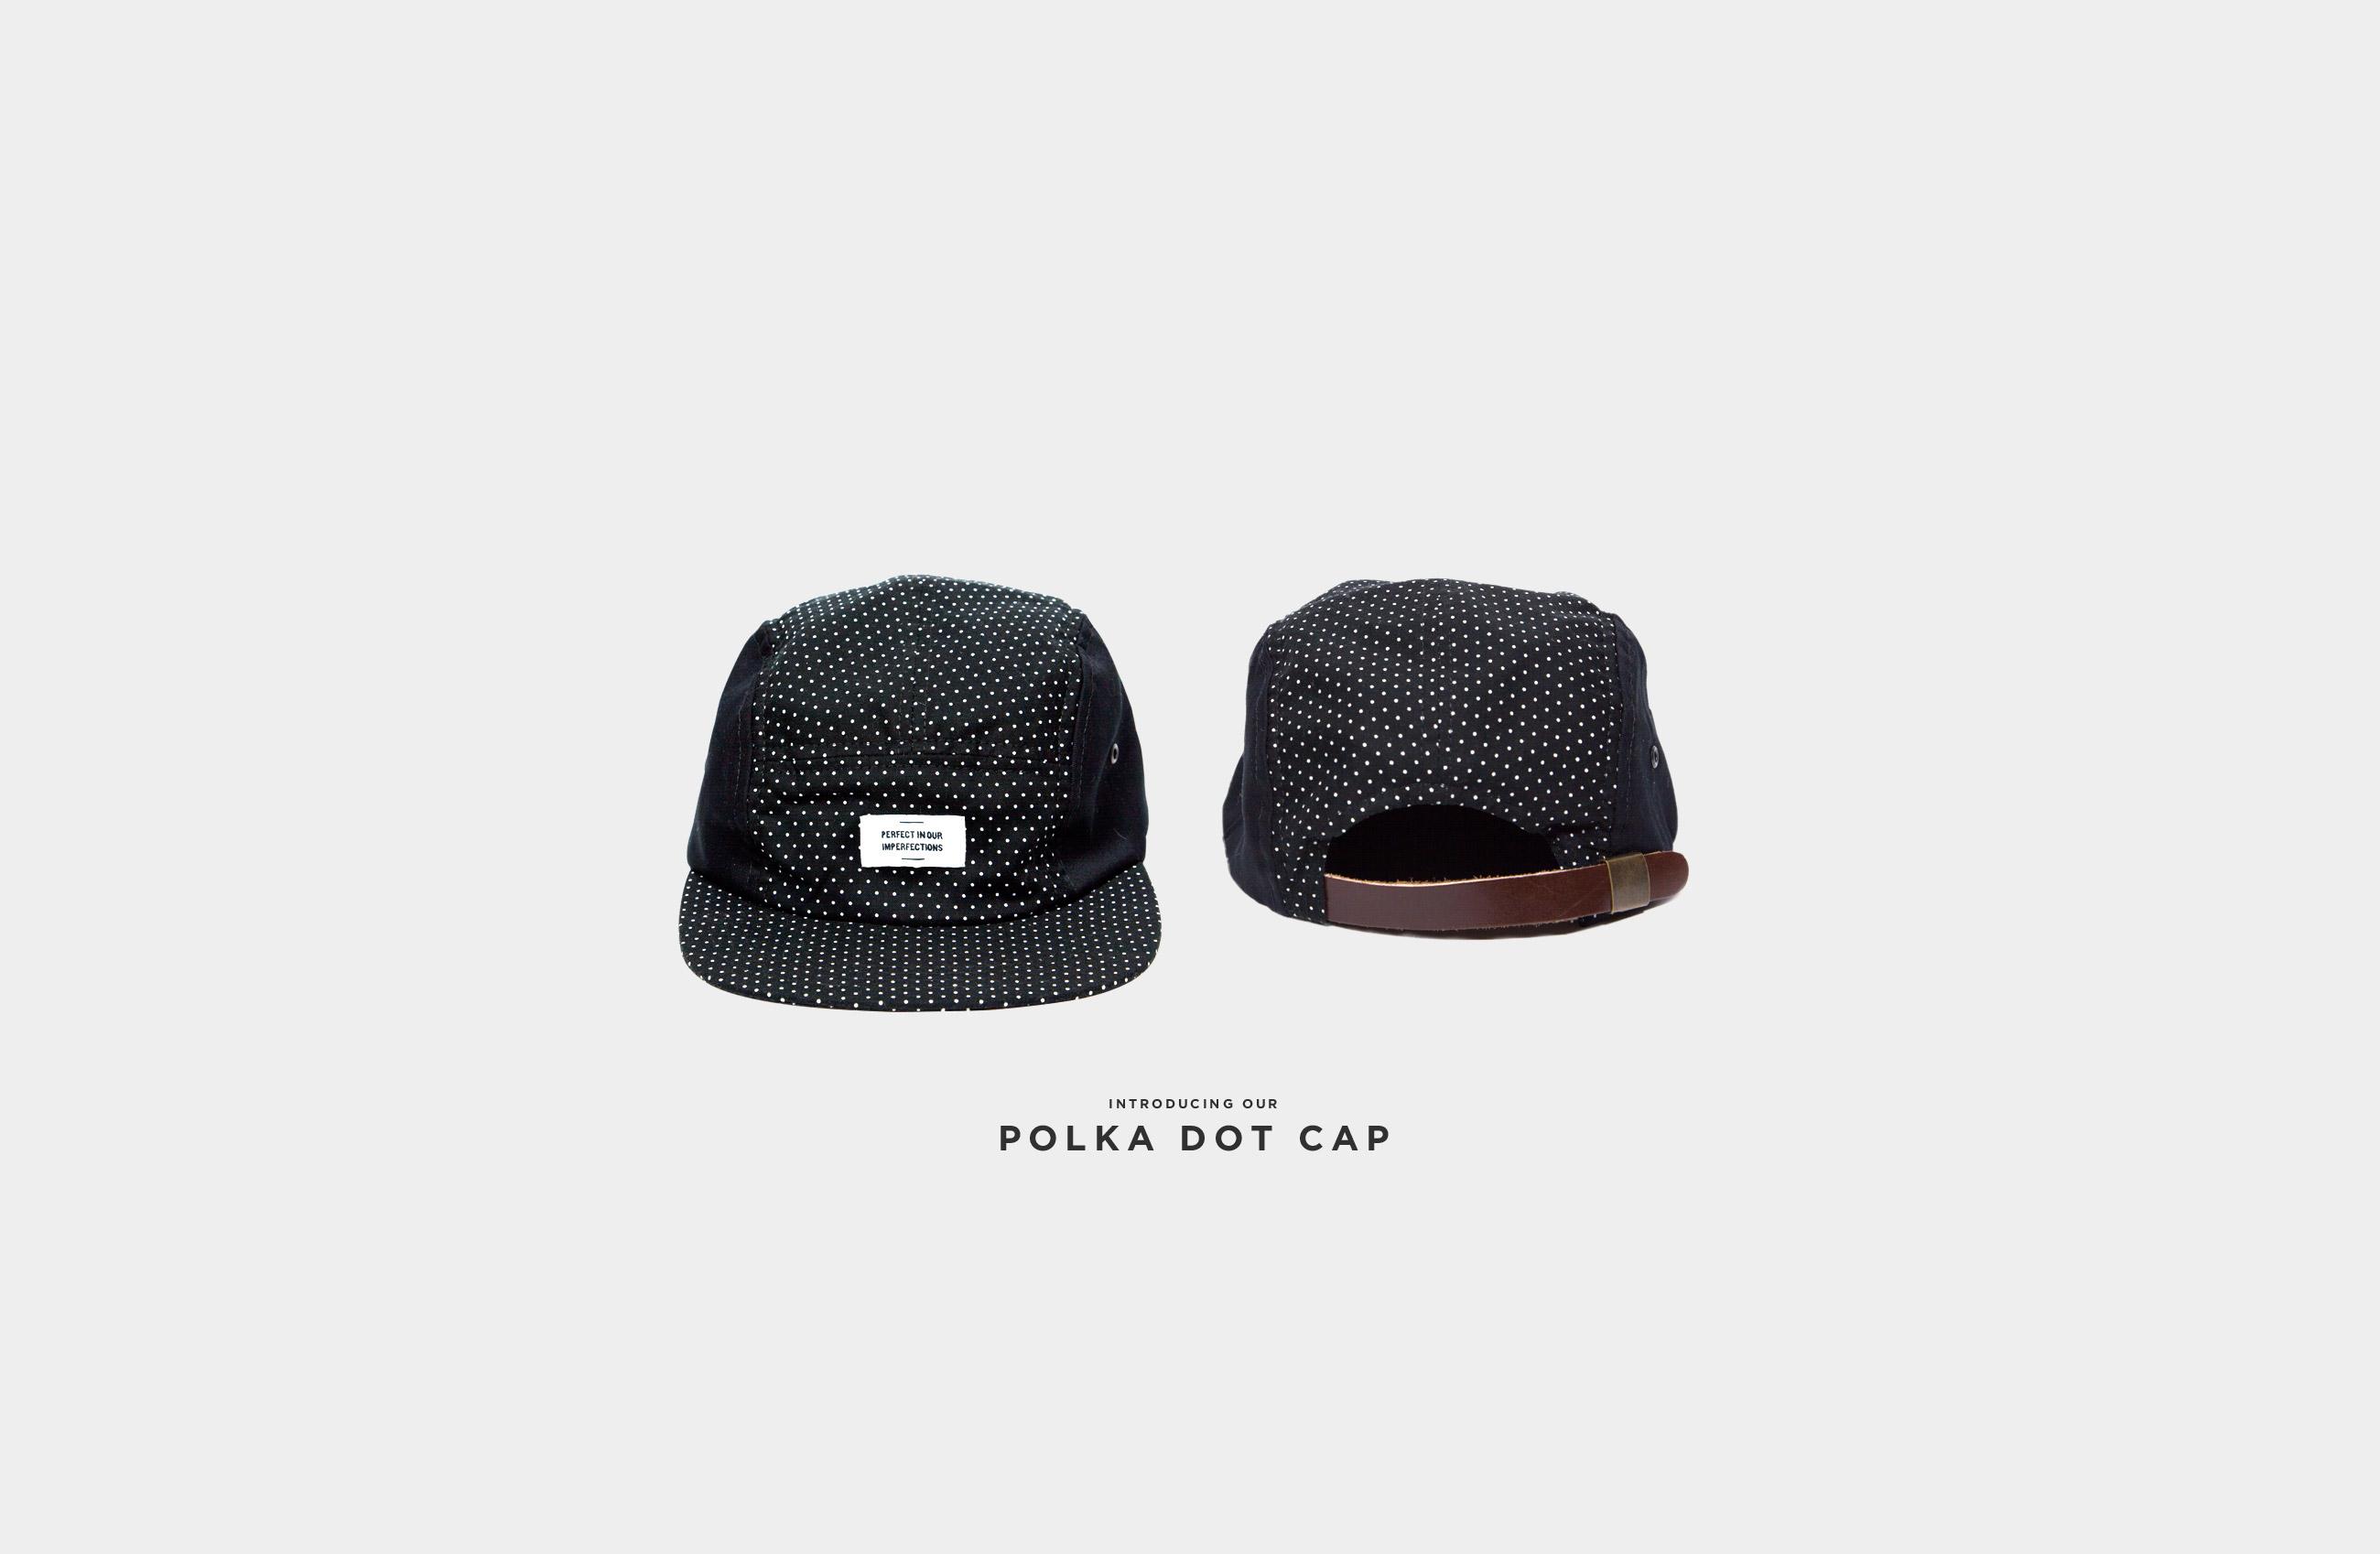 The Polka Dot Cap